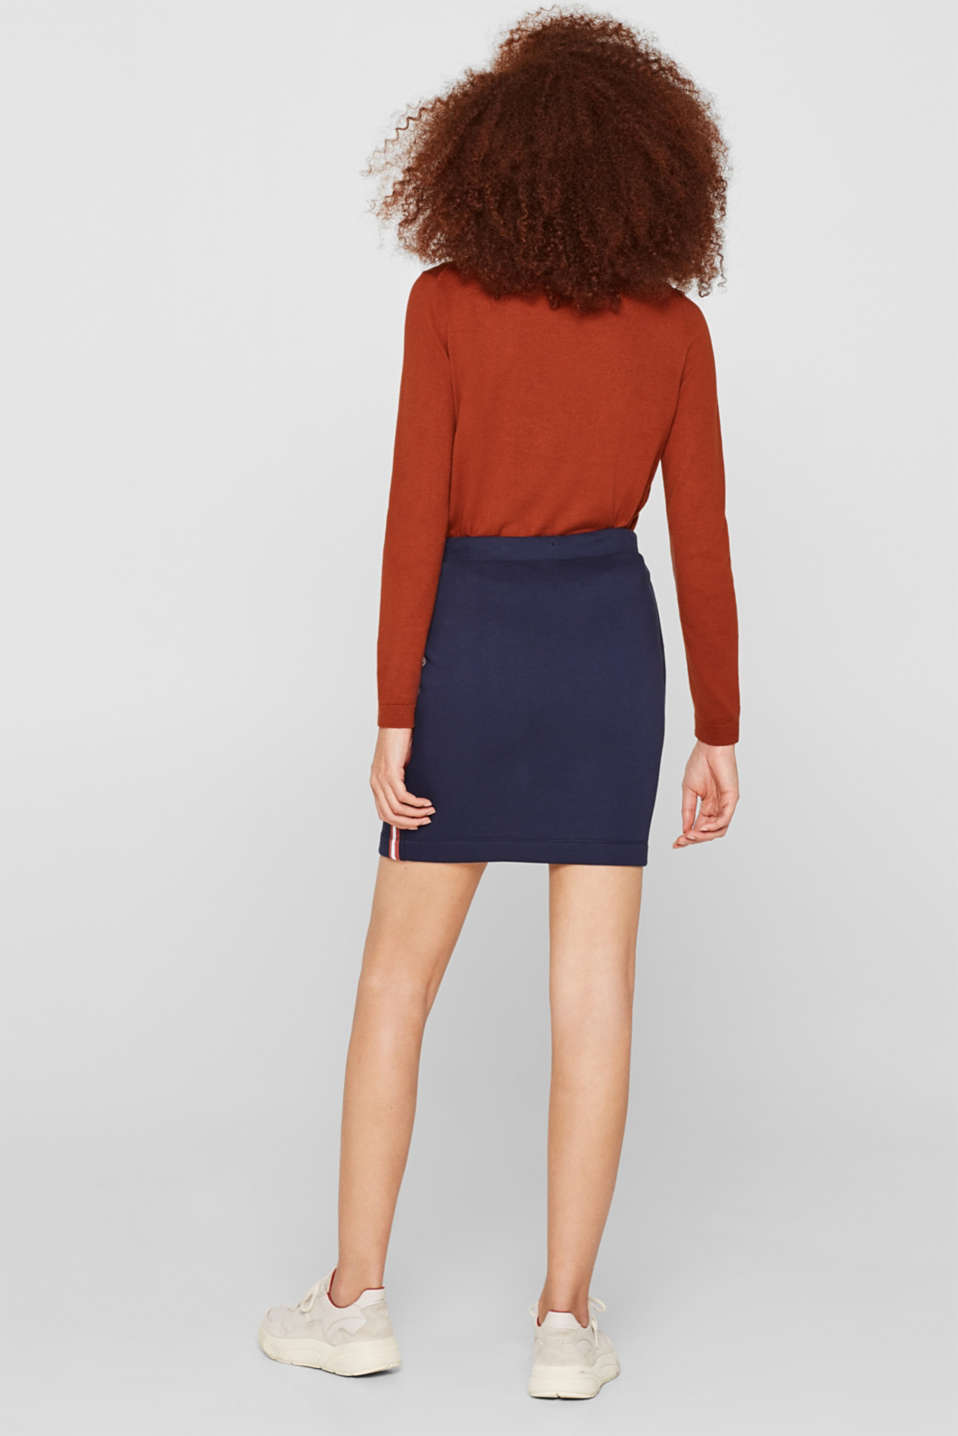 Sweatshirt skirt with racing stripes, NAVY, detail image number 3